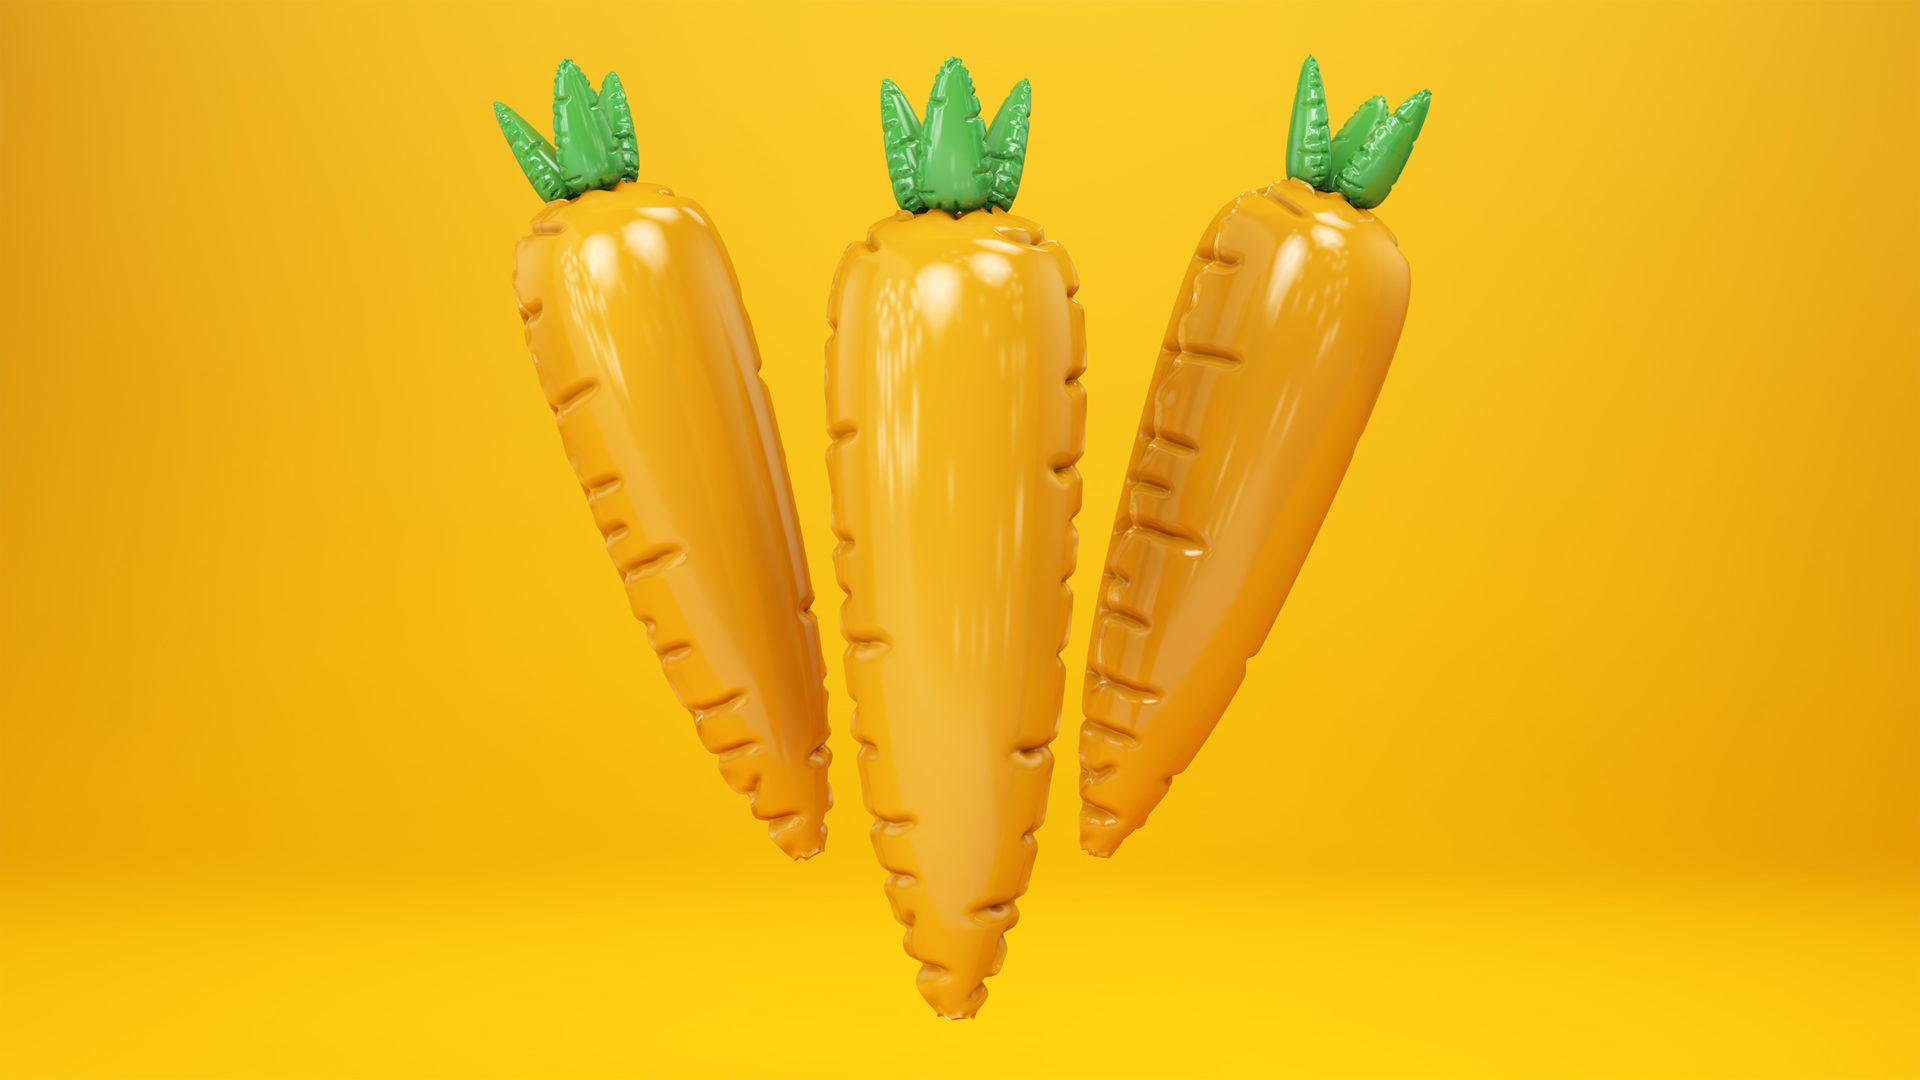 Plastik Lebensmittel. Karotten aus Plastik.